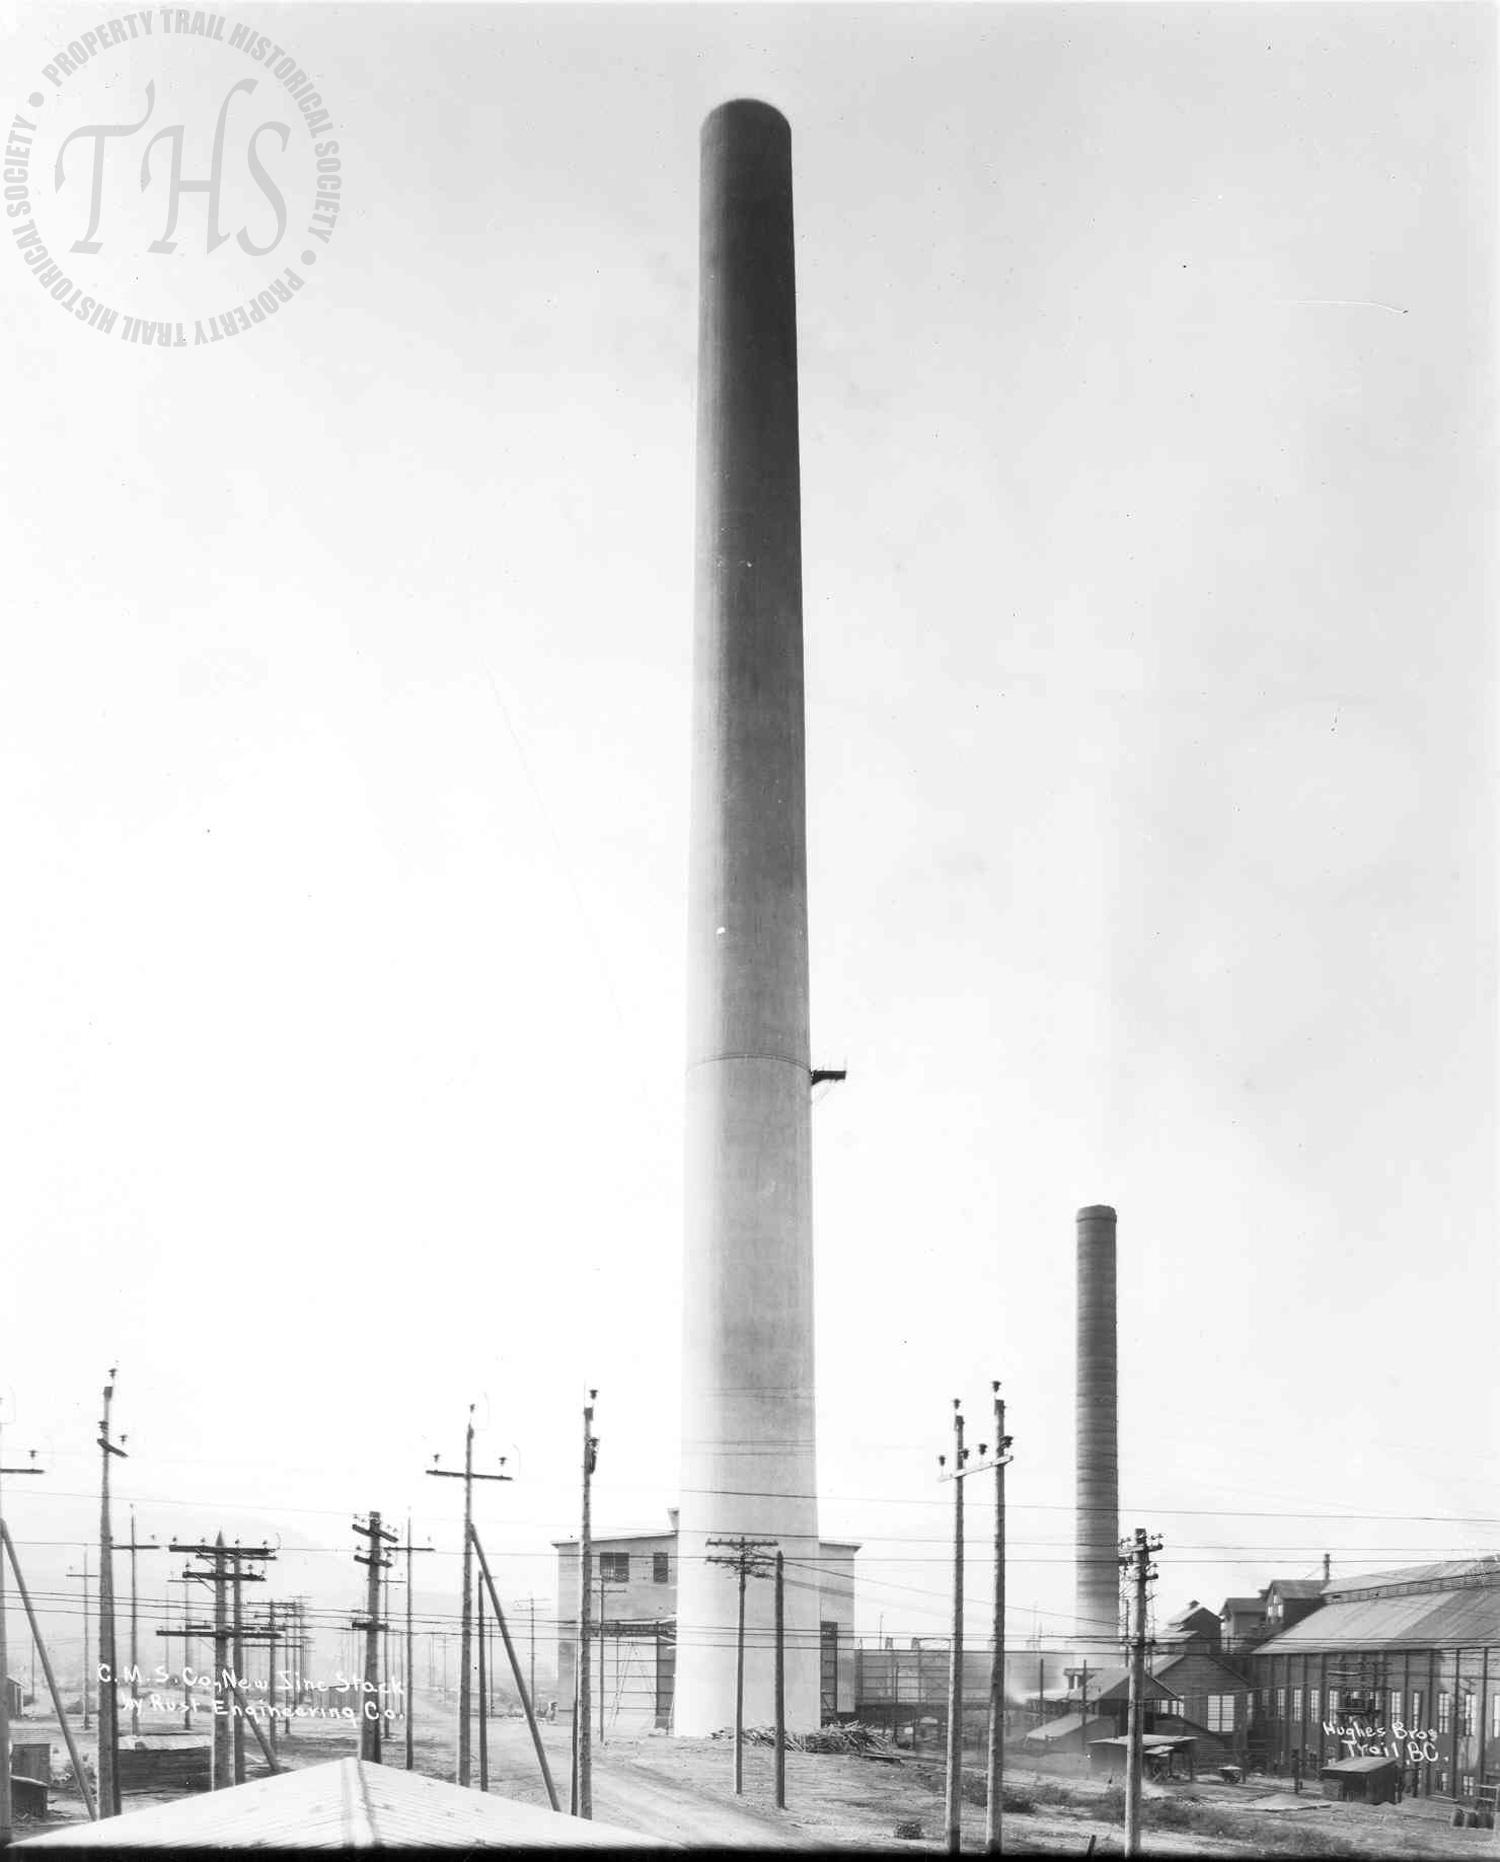 New zinc stack at Trail Smelter (Hughes) - 1920